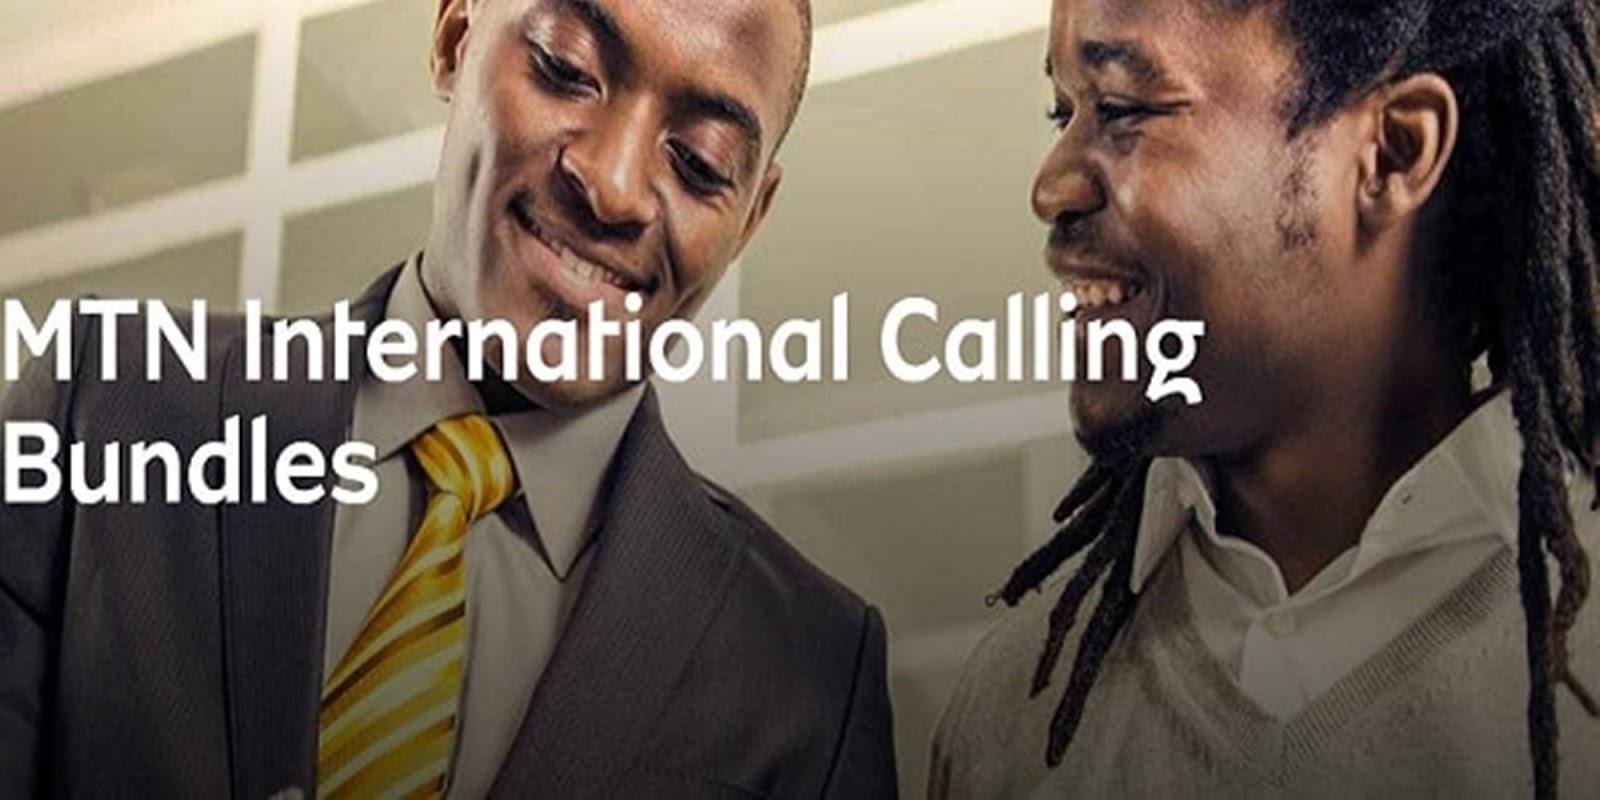 Mtn Cameroon International Call Bundles and Rates